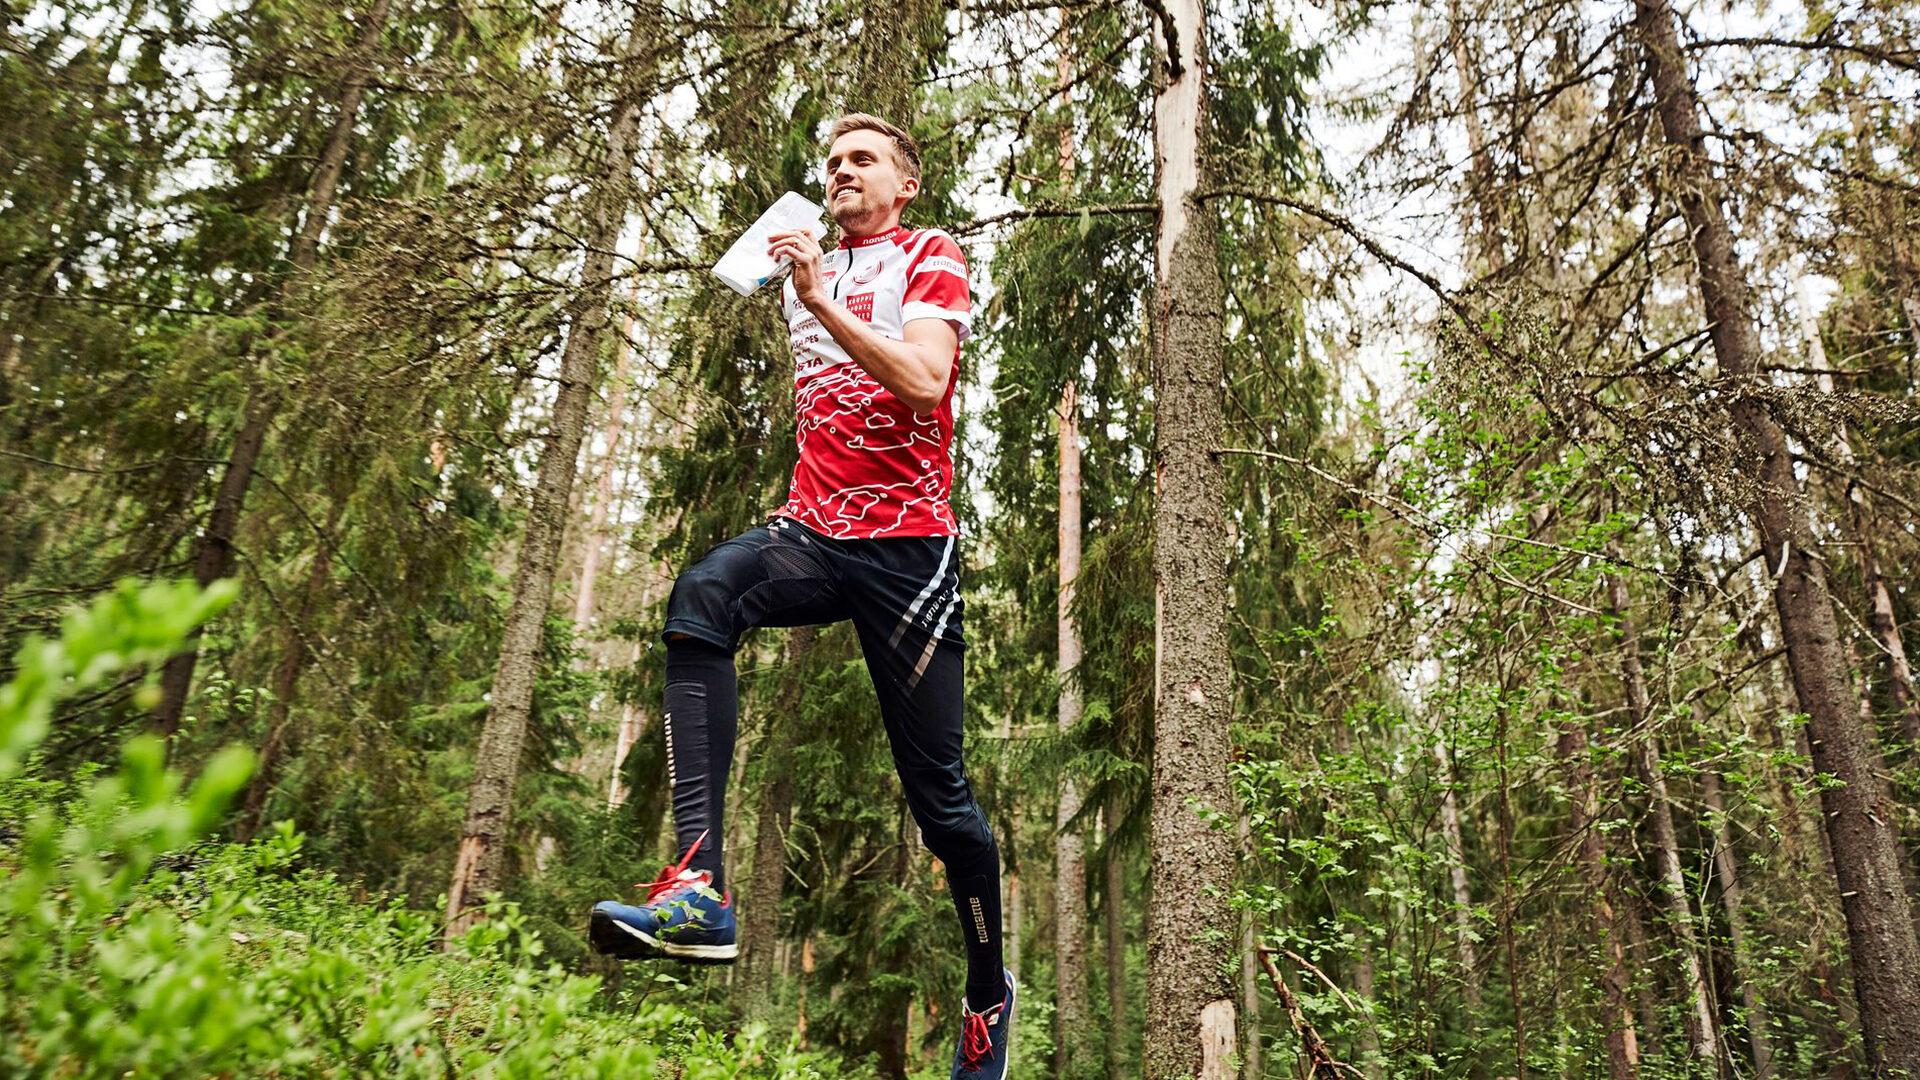 MM-mitalisti huippusuunnistaja Aleksi Niemi